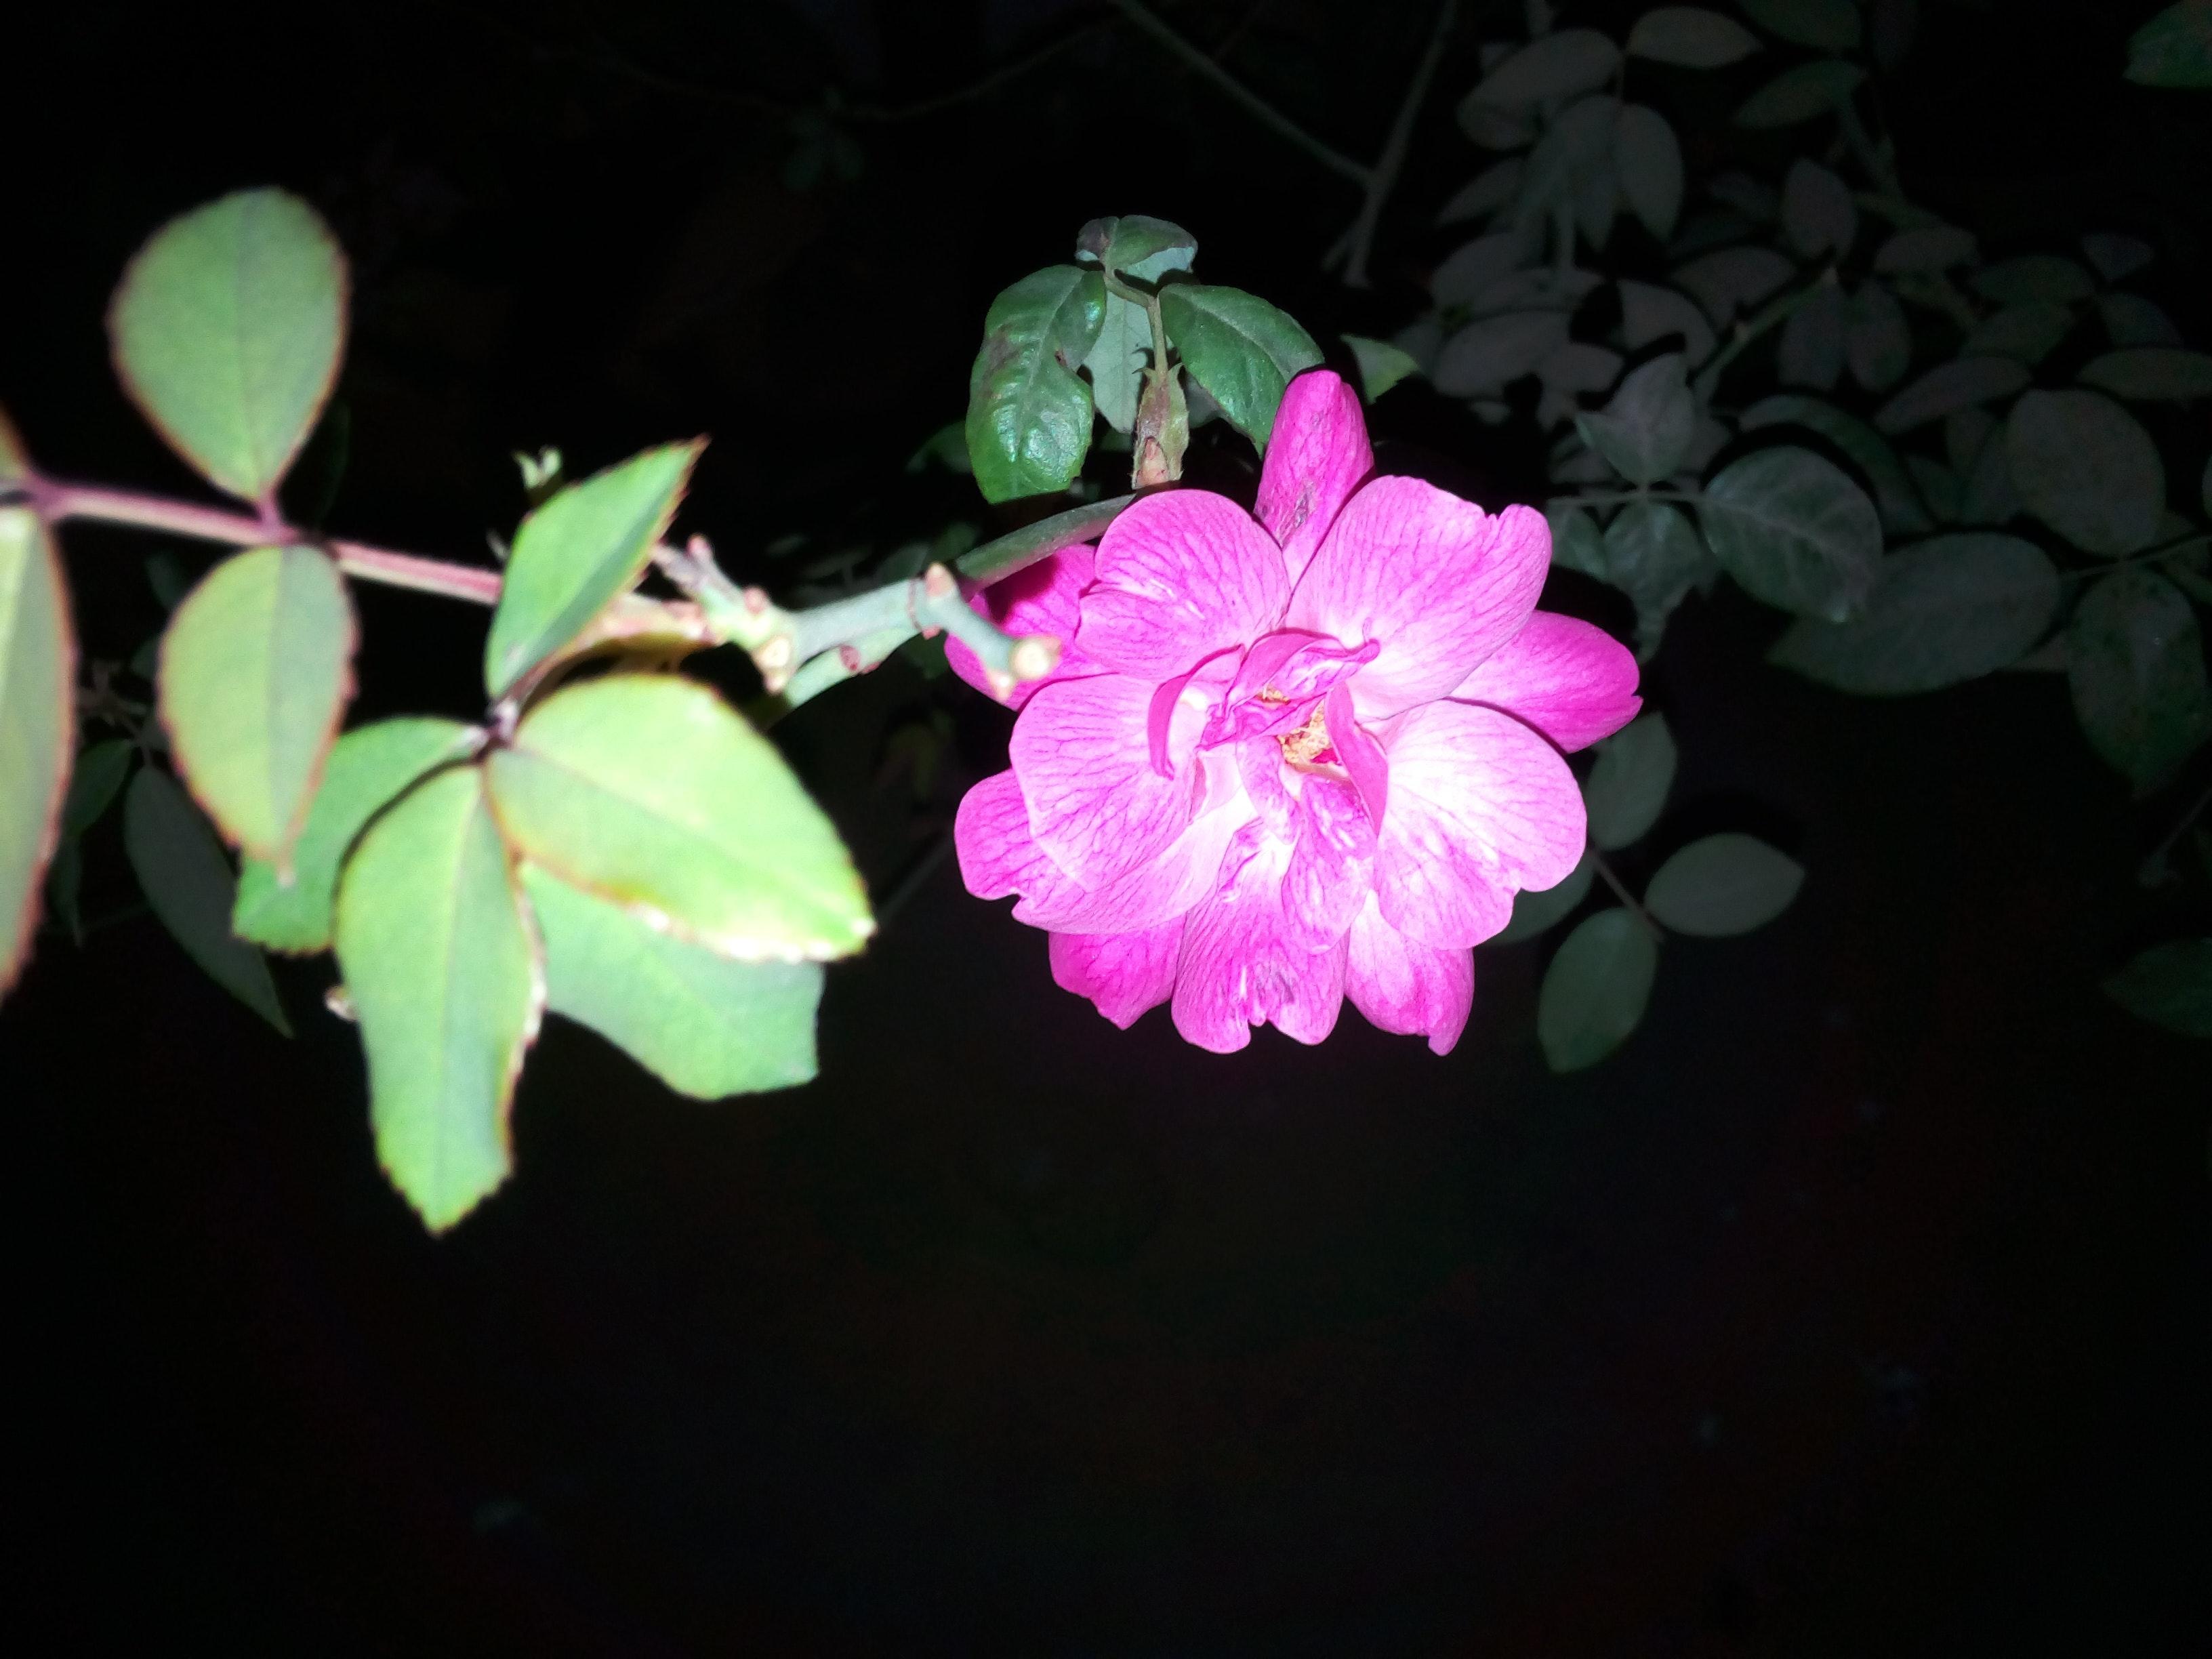 Free stock photo of beautiful flowers night pink rose free download izmirmasajfo